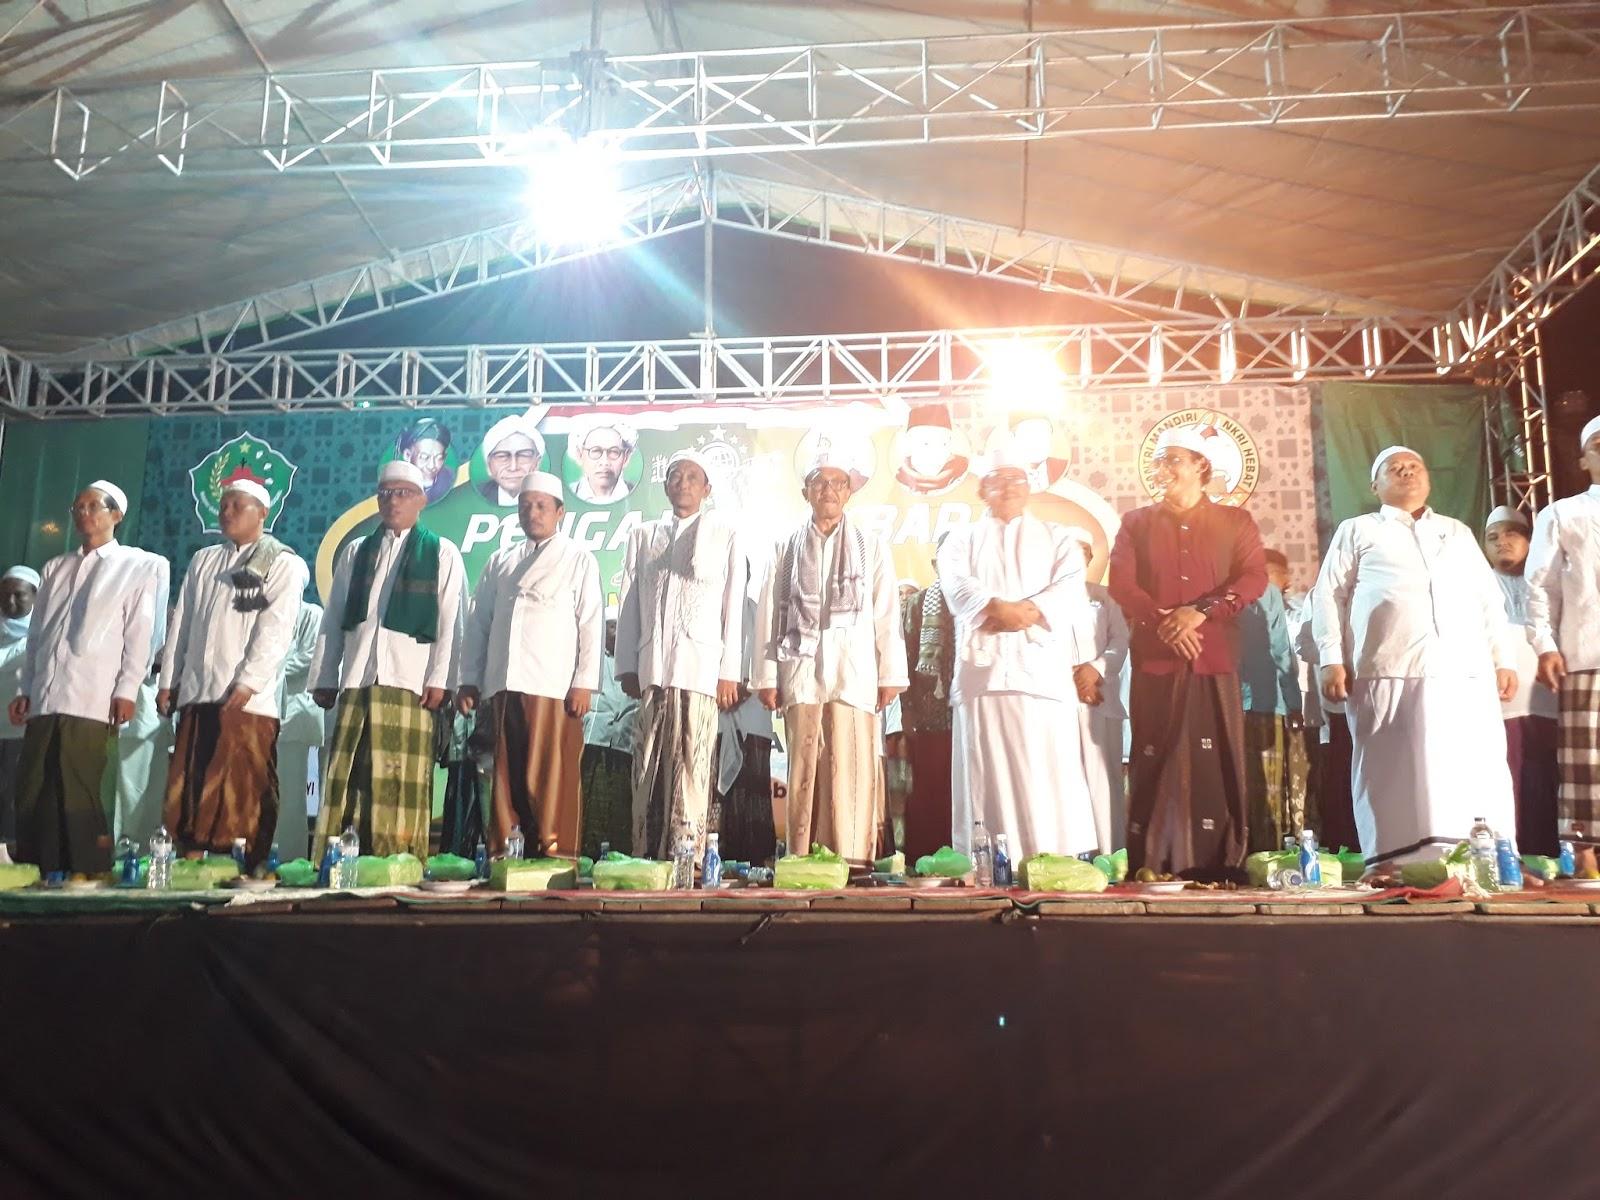 Ribuan Santri Kab Pamekasan Padati Pengajian Akbar Hari Nasional Hsn